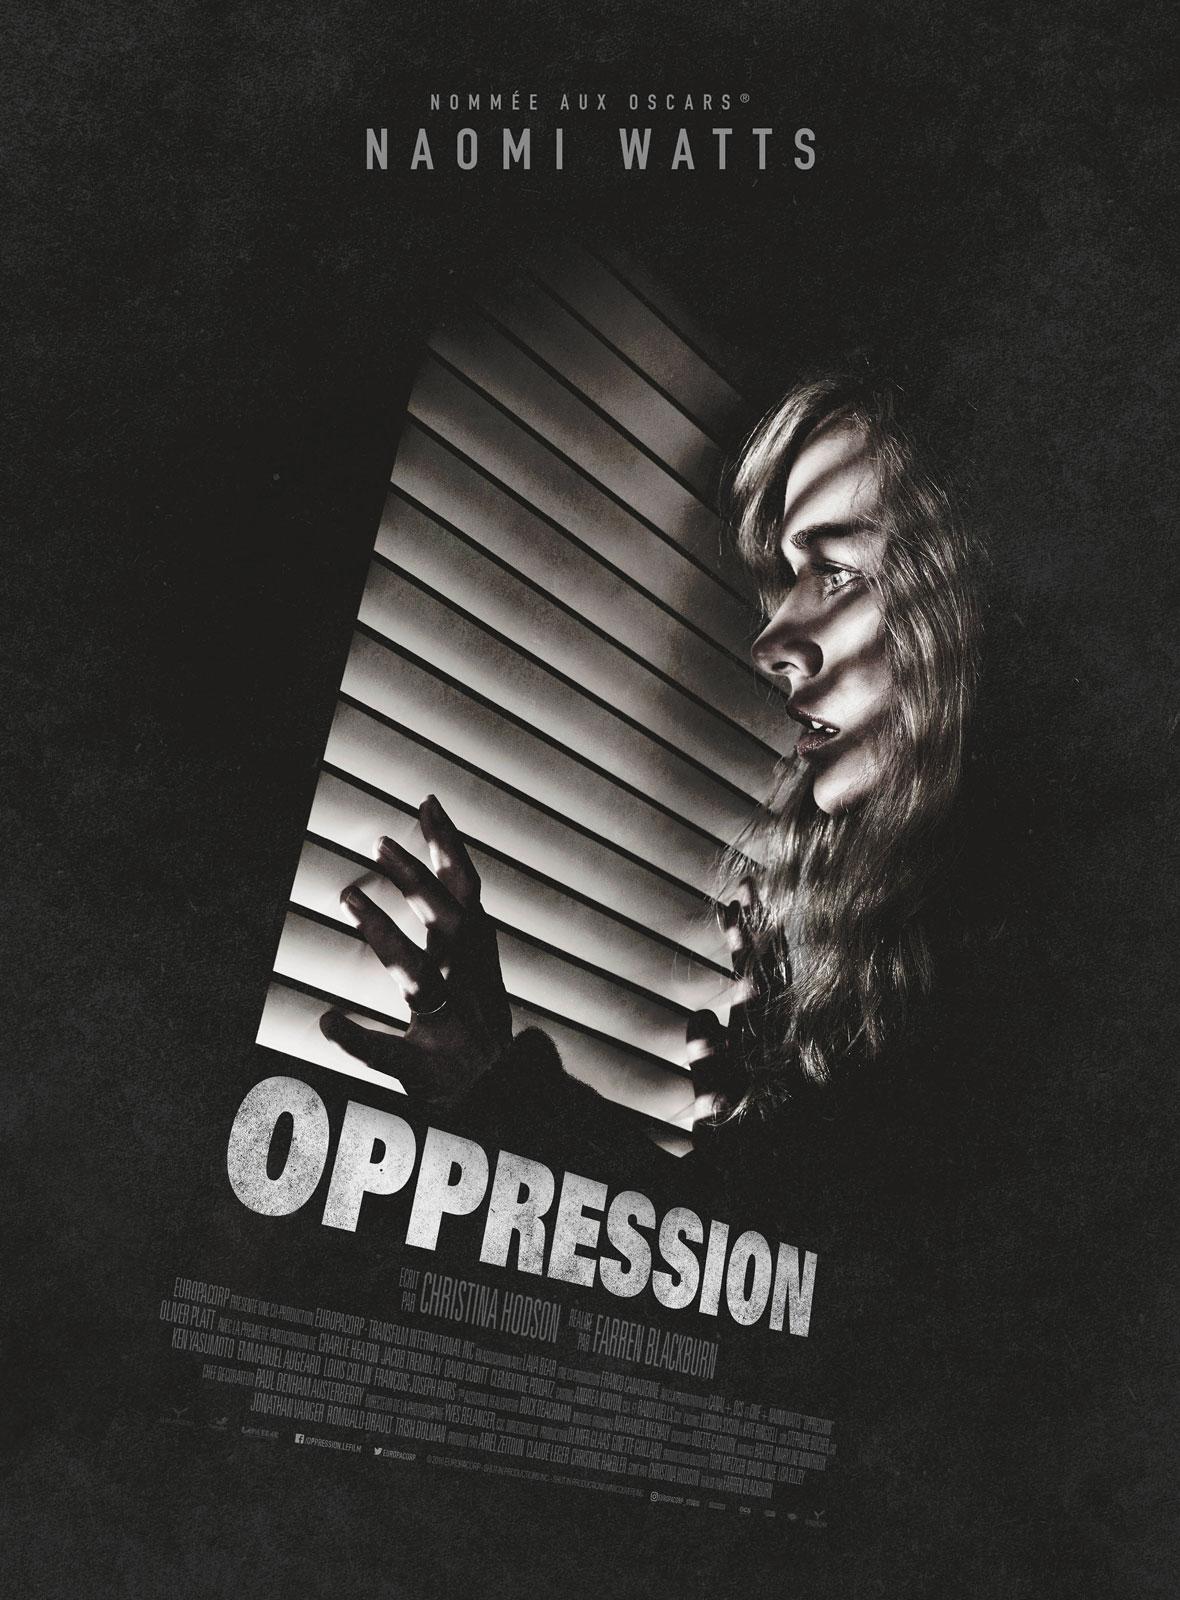 Oppression streaming